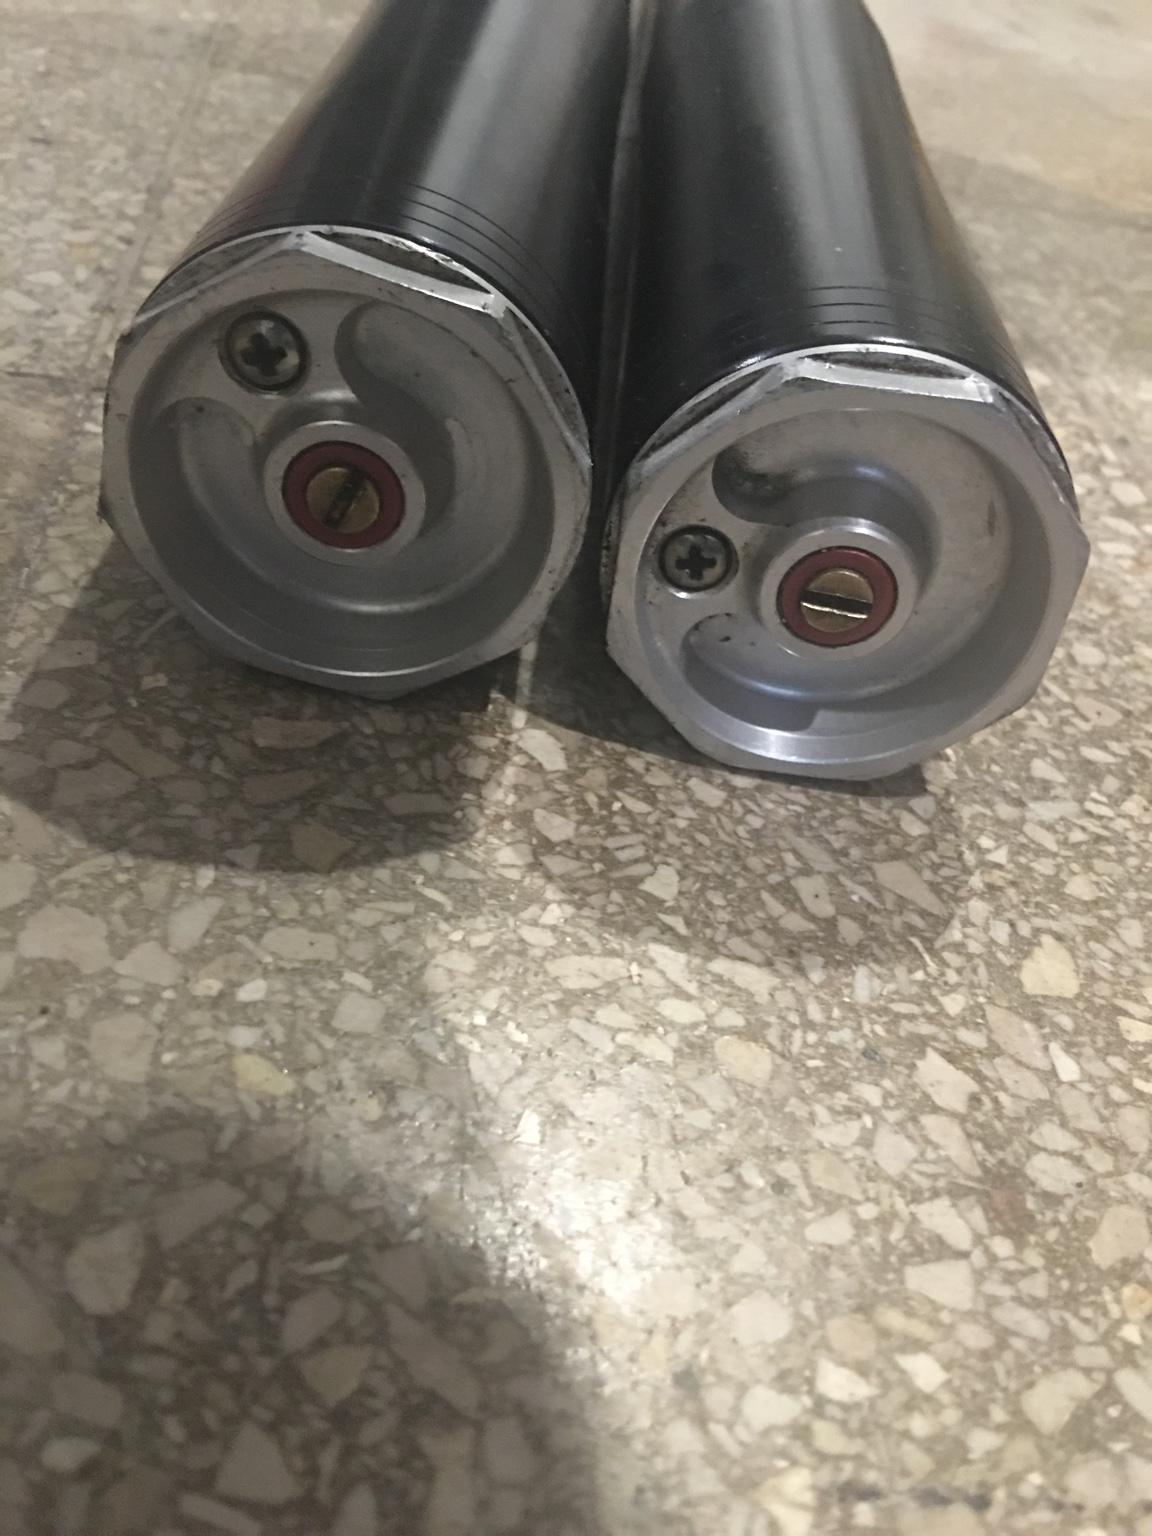 Vendo accessori forcella paioli kayaba 48 solo enduro for San luis bay motors kia